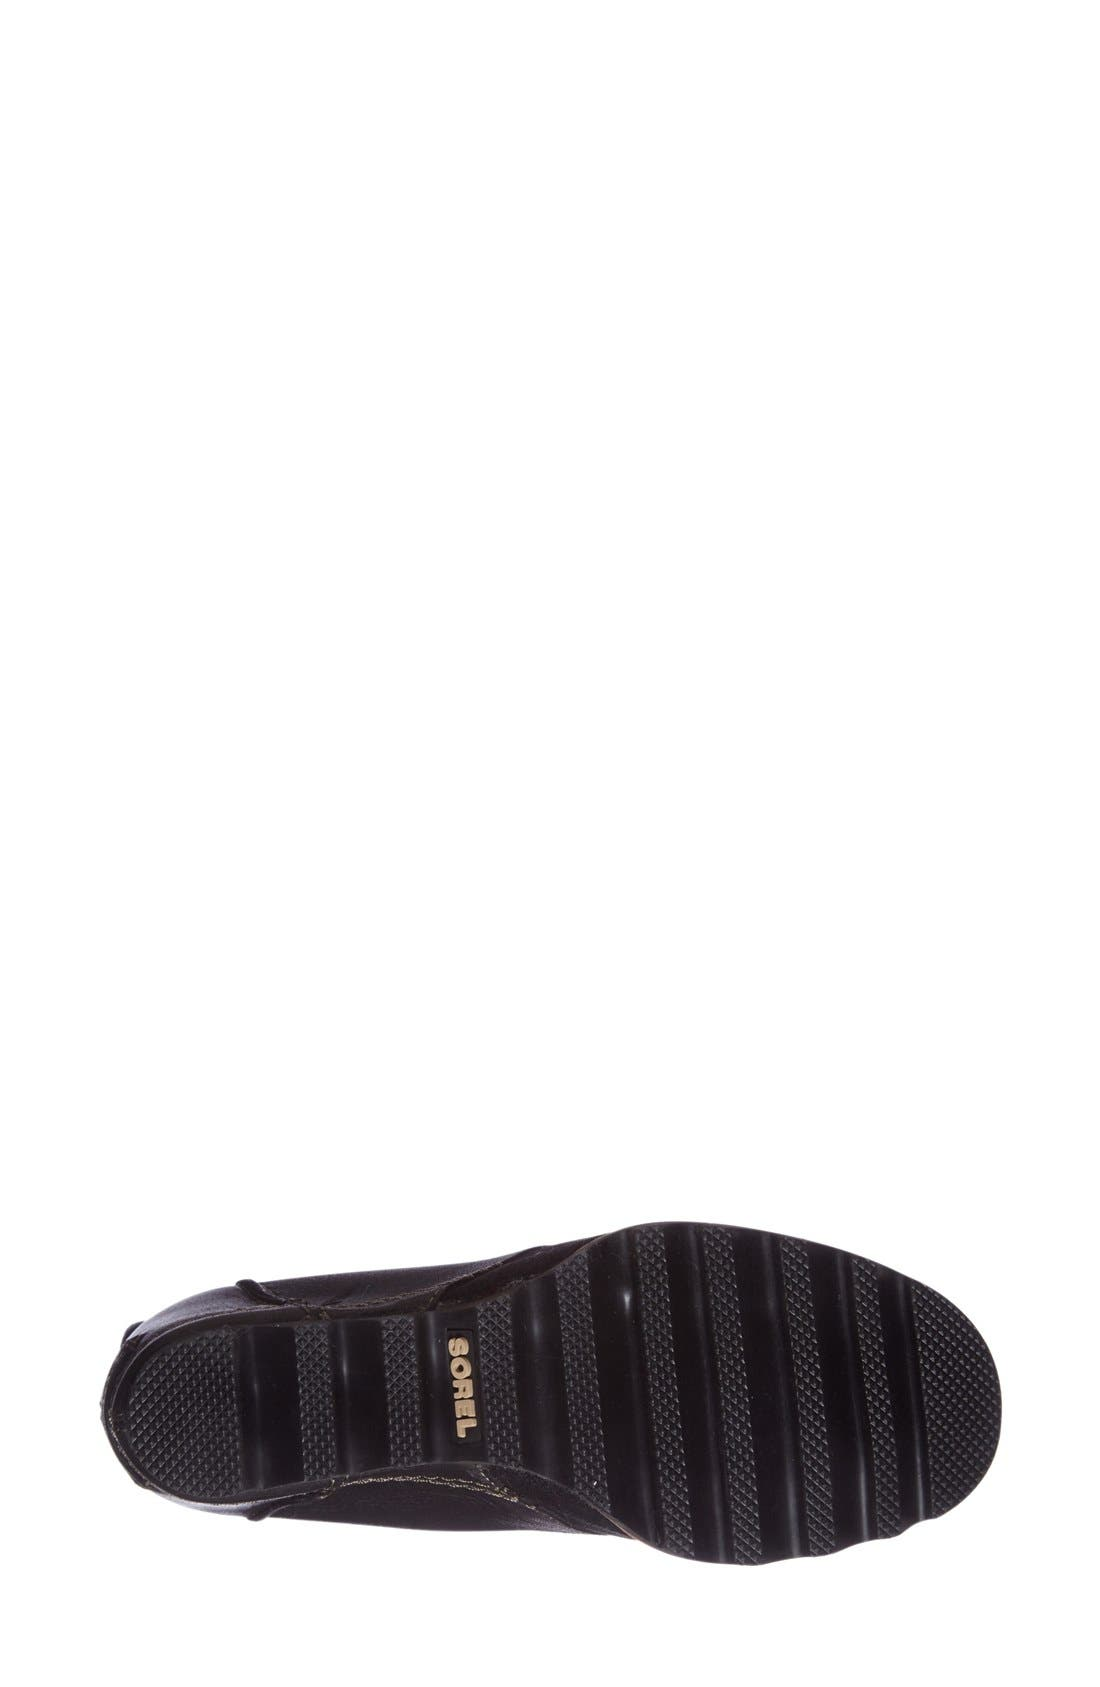 Alternate Image 4  - SOREL 'Cate the Great' Waterproof Wedge Boot (Women)